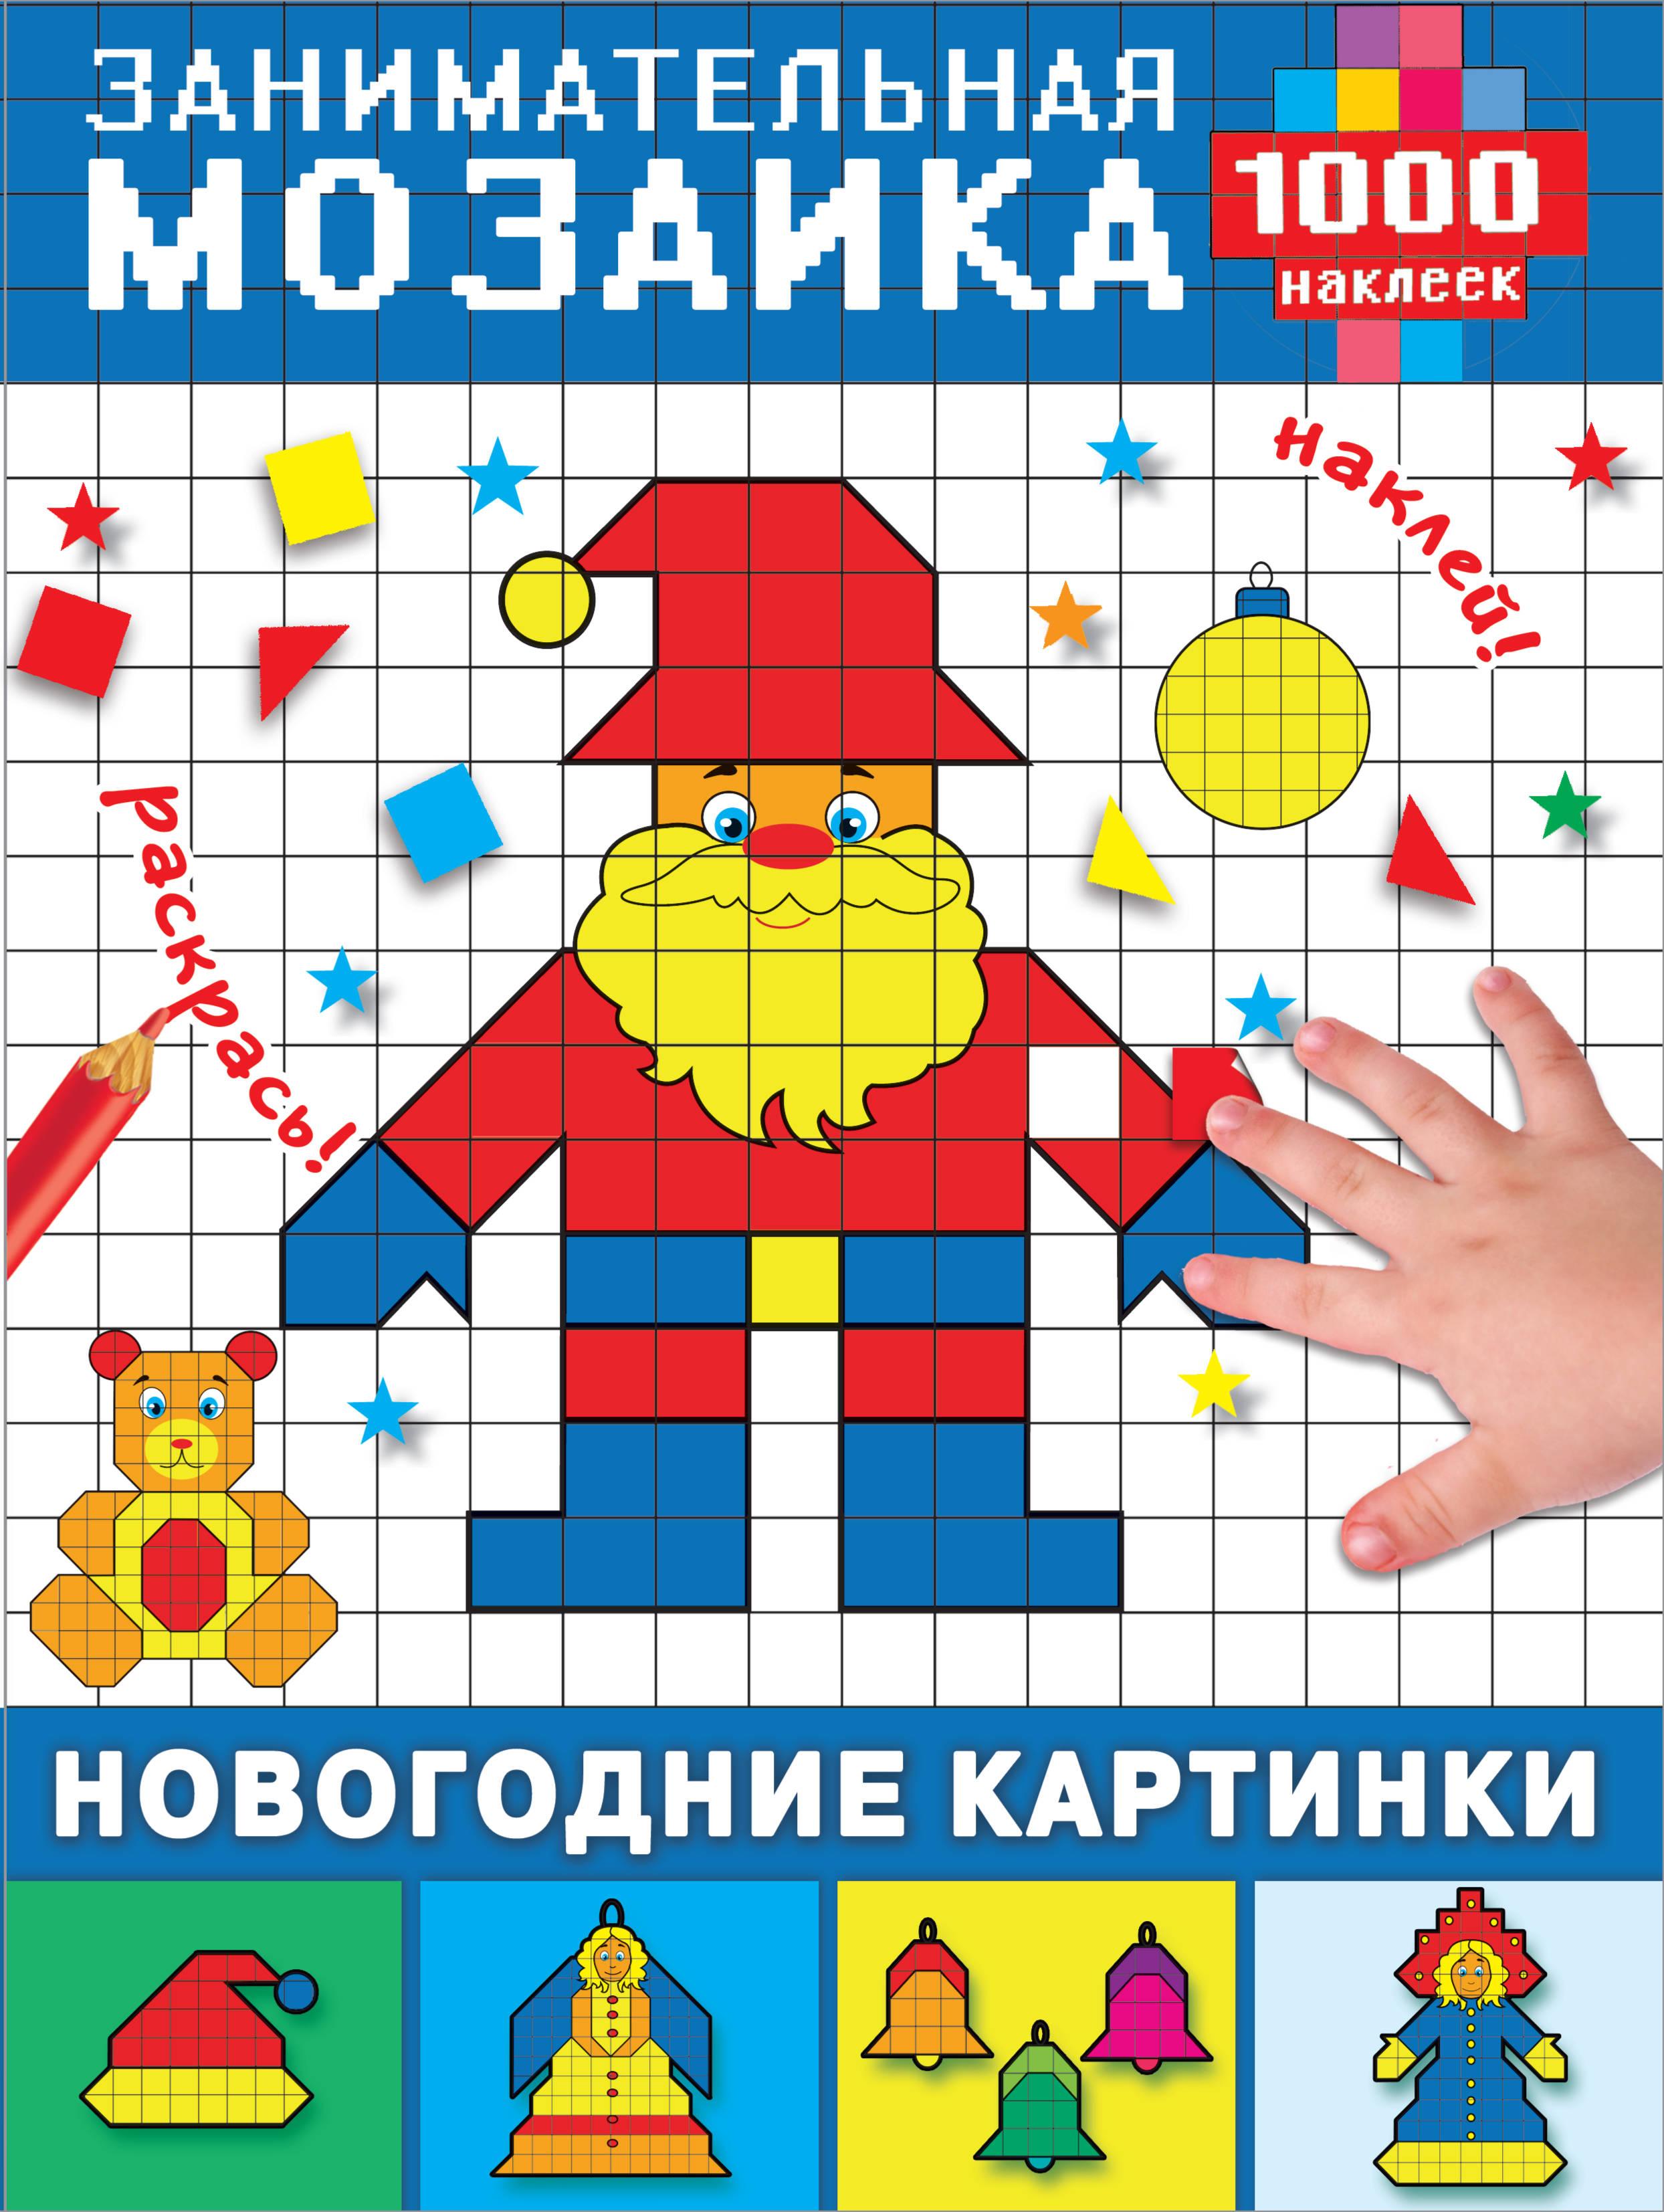 Глотова М.Д. Новогодние картинки